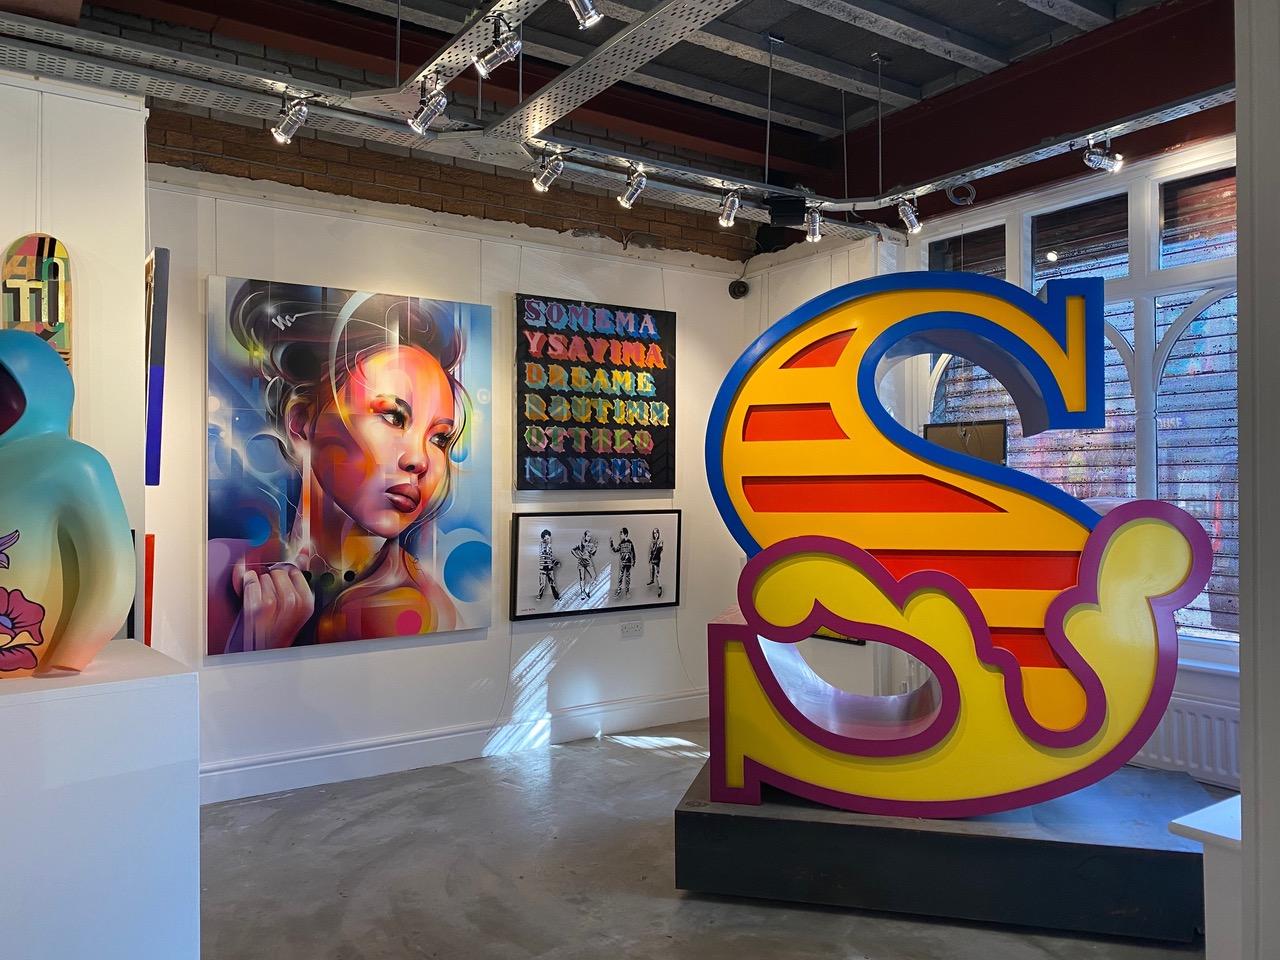 Oakland Gallery: Together